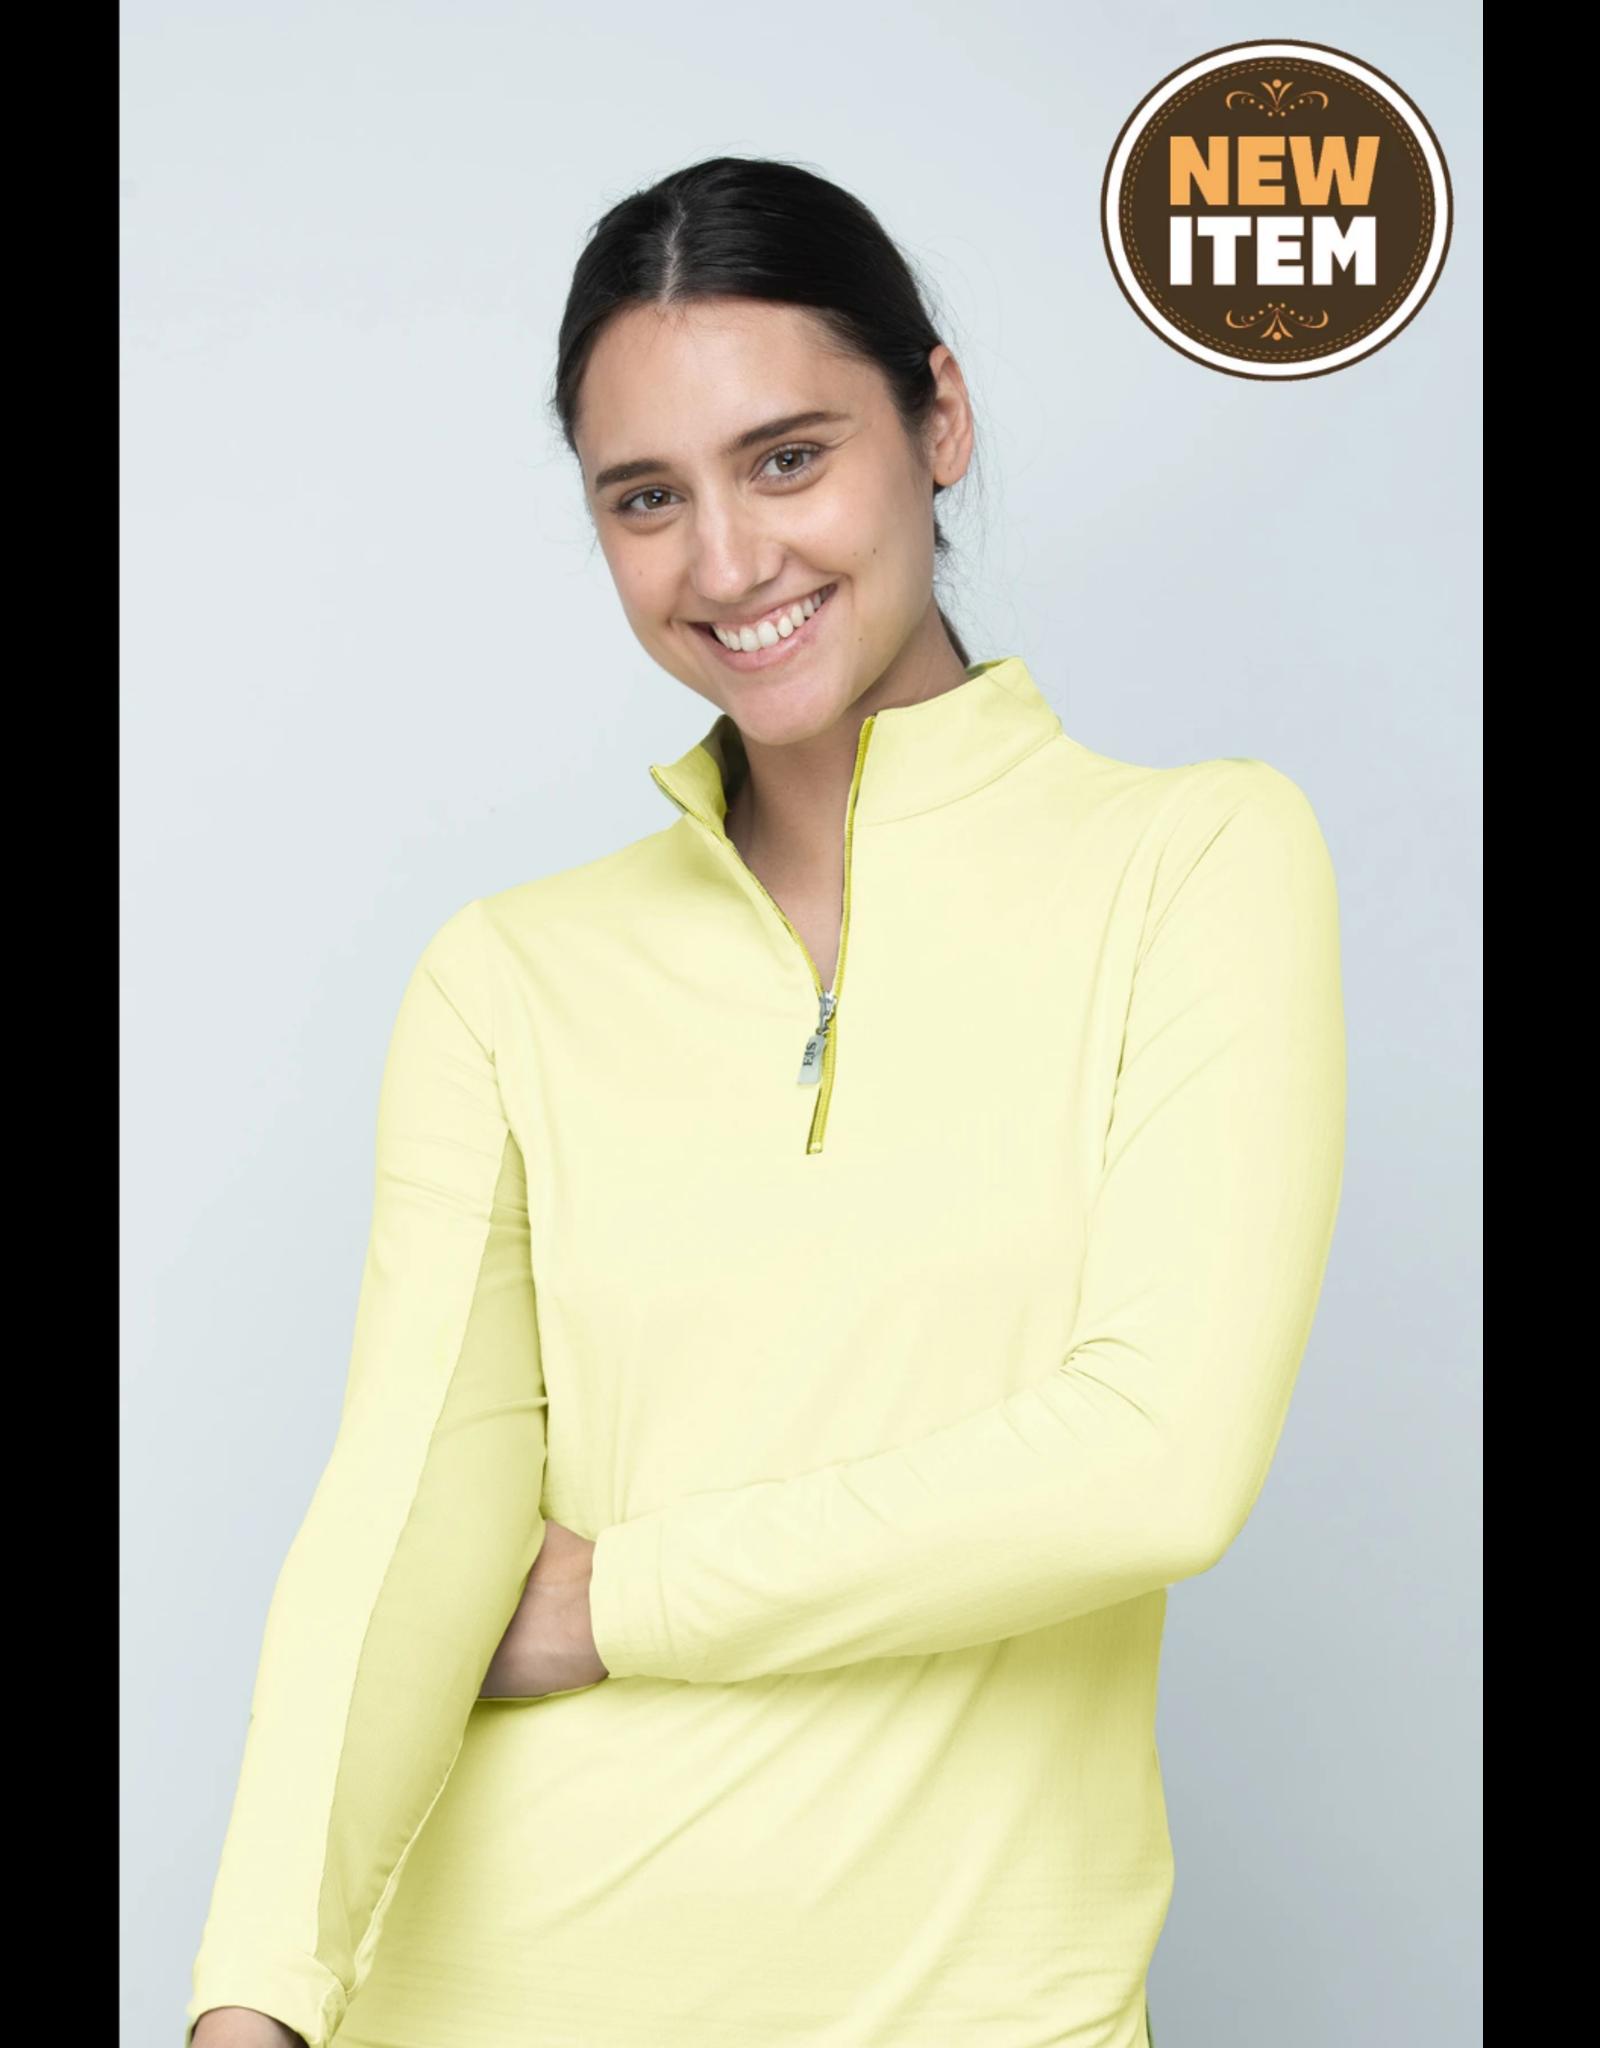 EIS Sun Shirt Vintage Solid Buttercup COOL Shirt